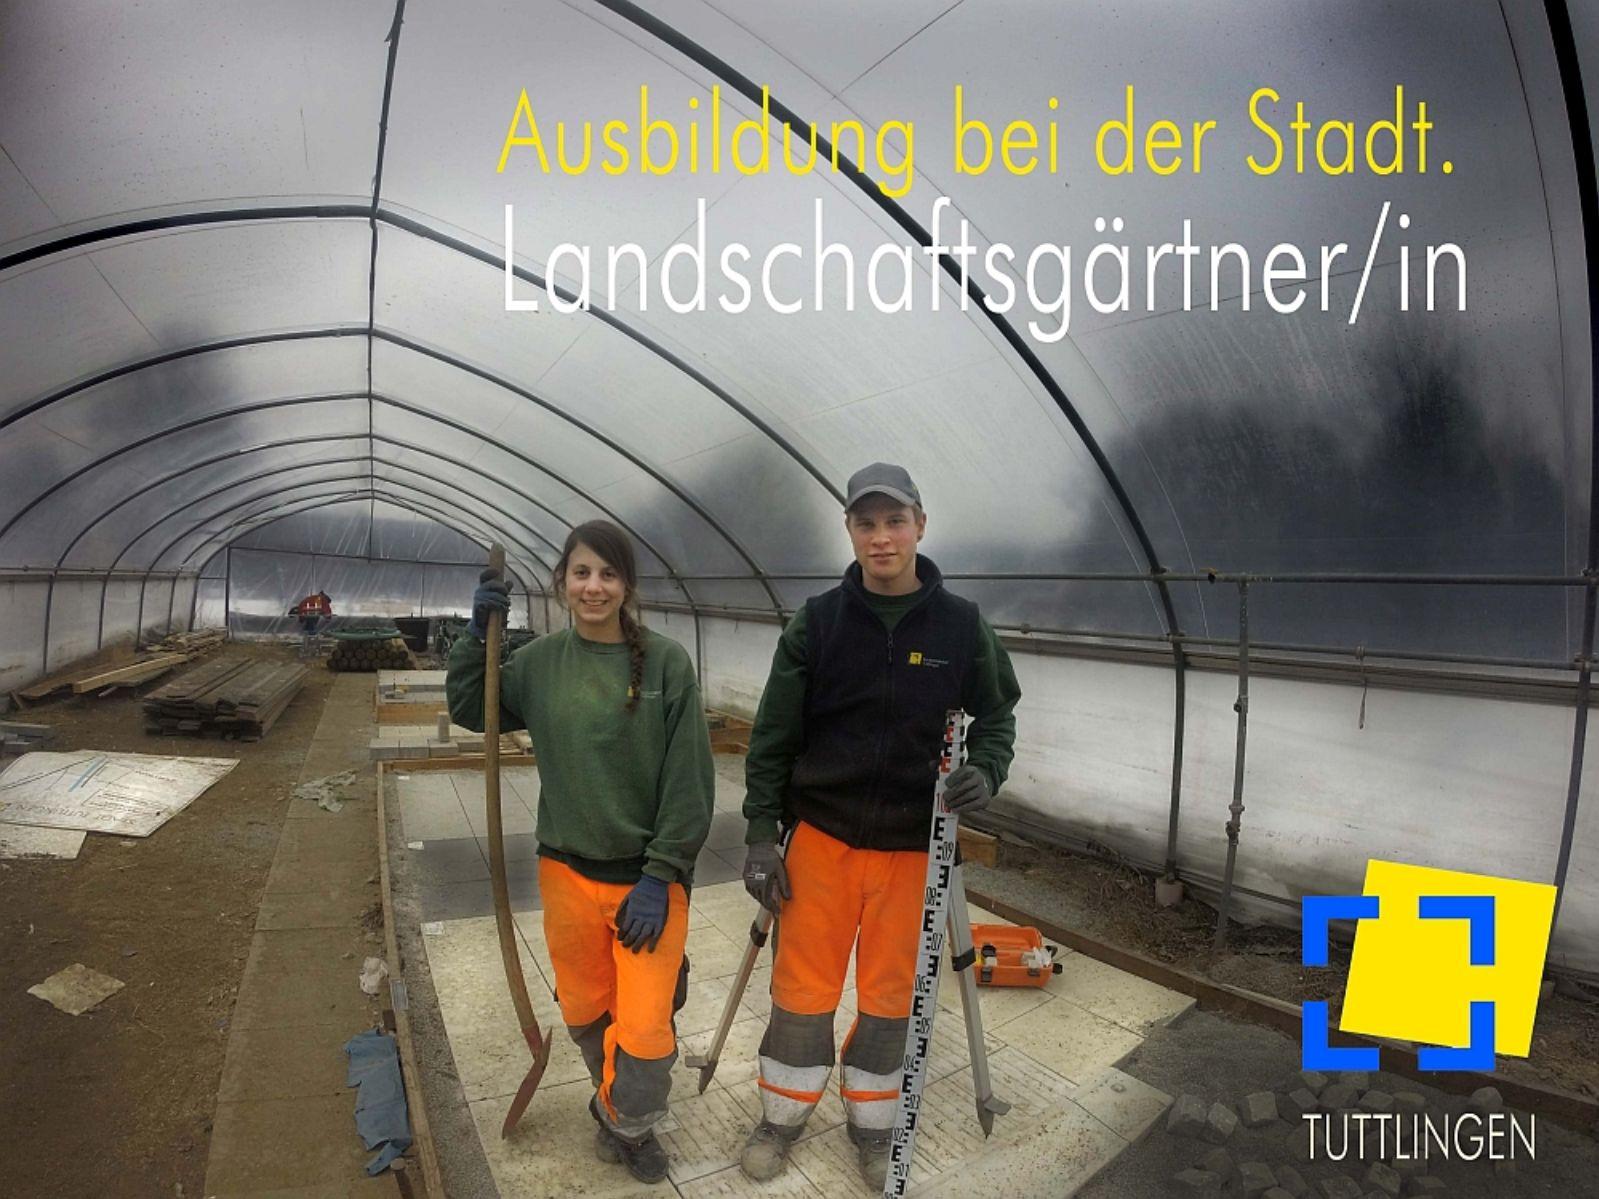 Landschaftsgaertner_HOMEPAGE